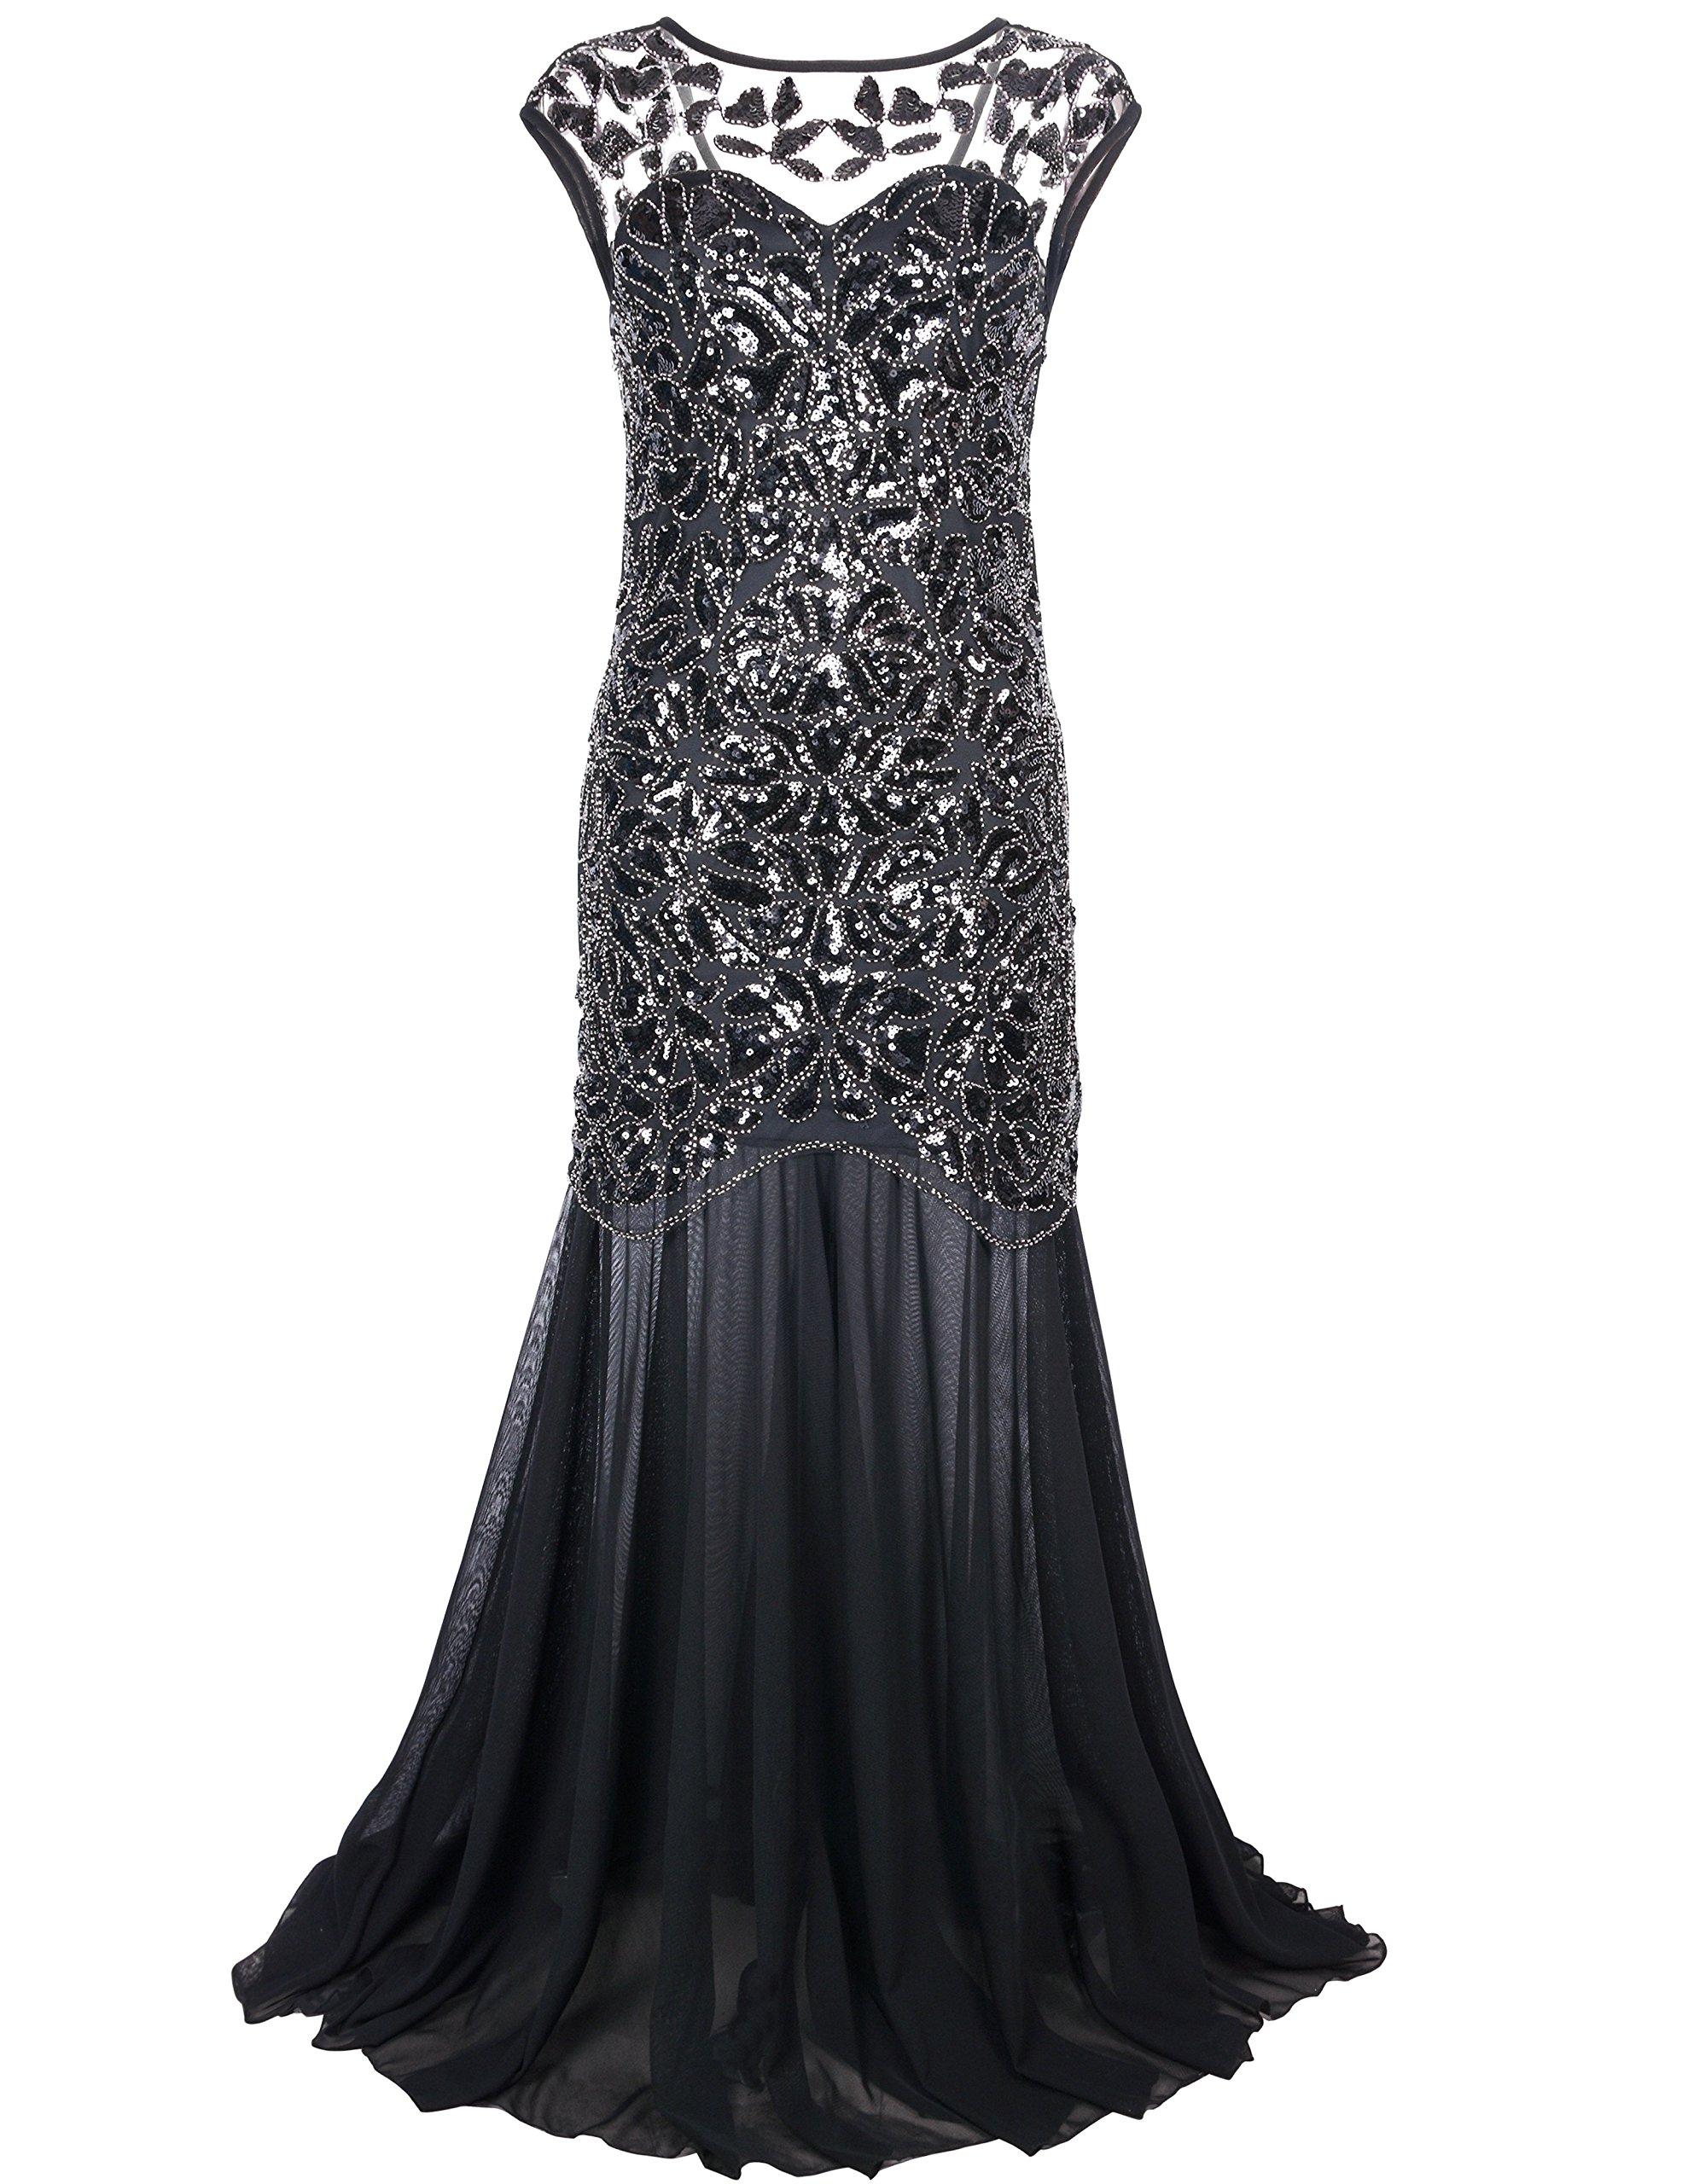 PrettyGuide Women 's 1920s Black Sequin Gatsby Maxi Long Evening Prom Dress, Black - 18/20 Plus